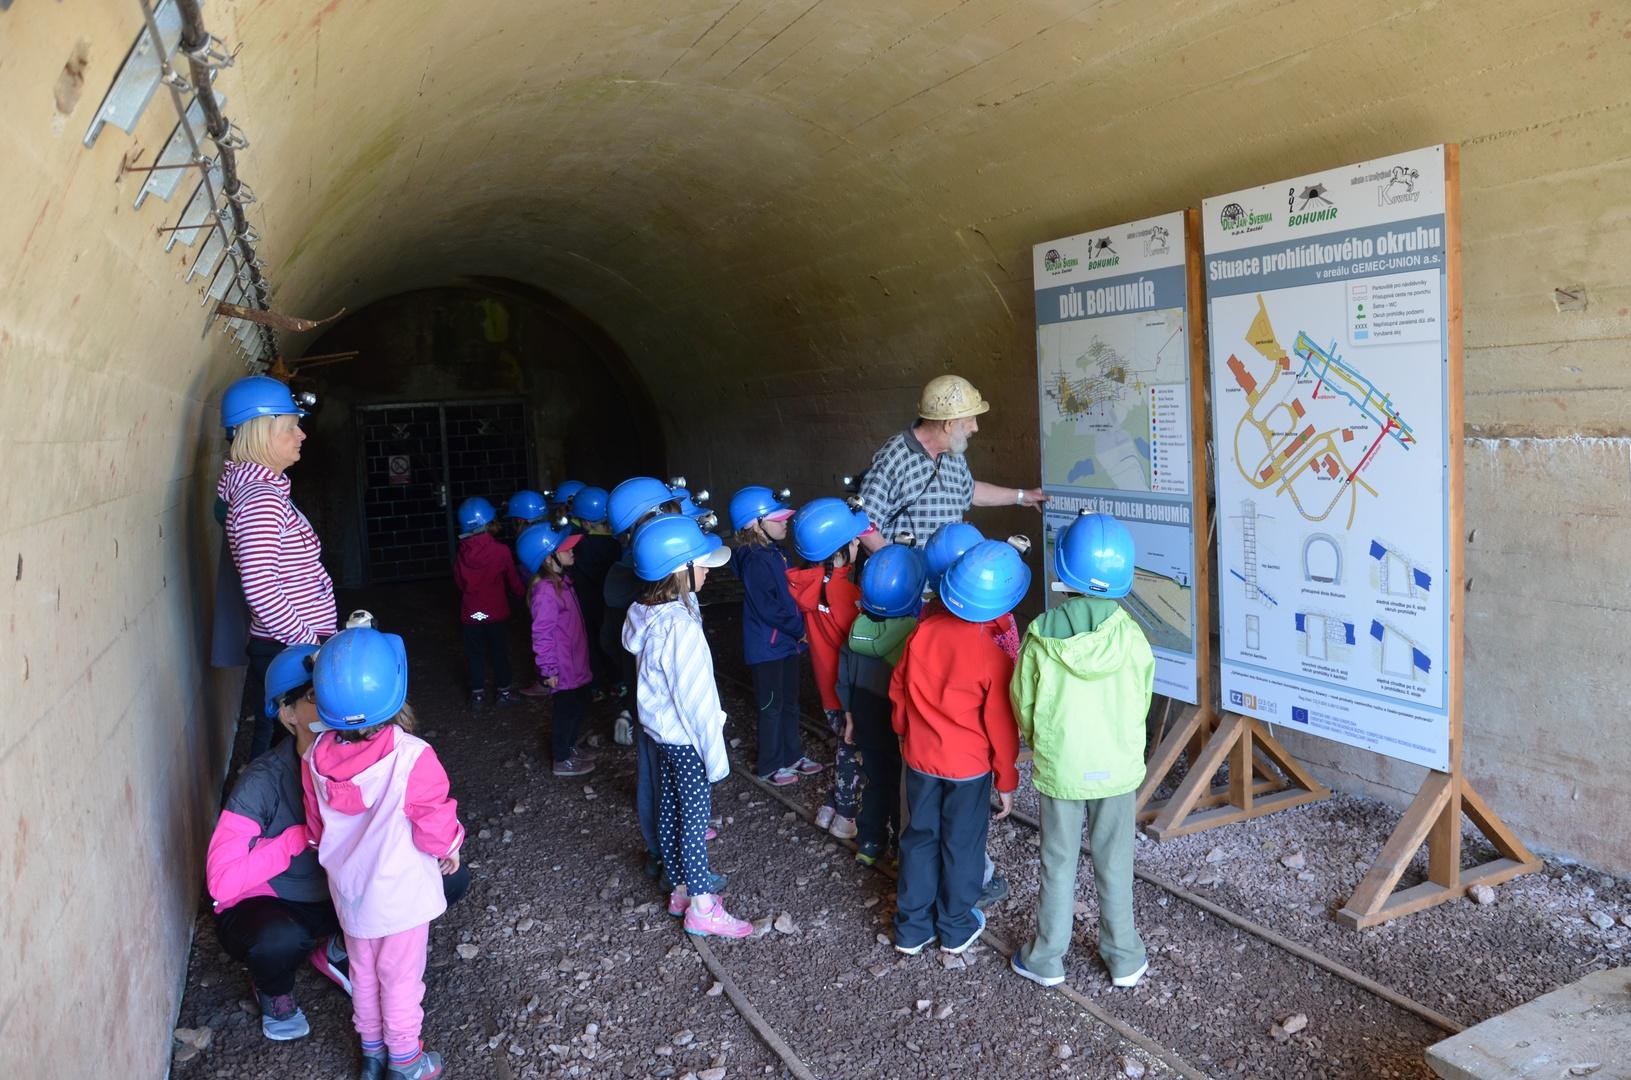 Důl Bohumír - děti